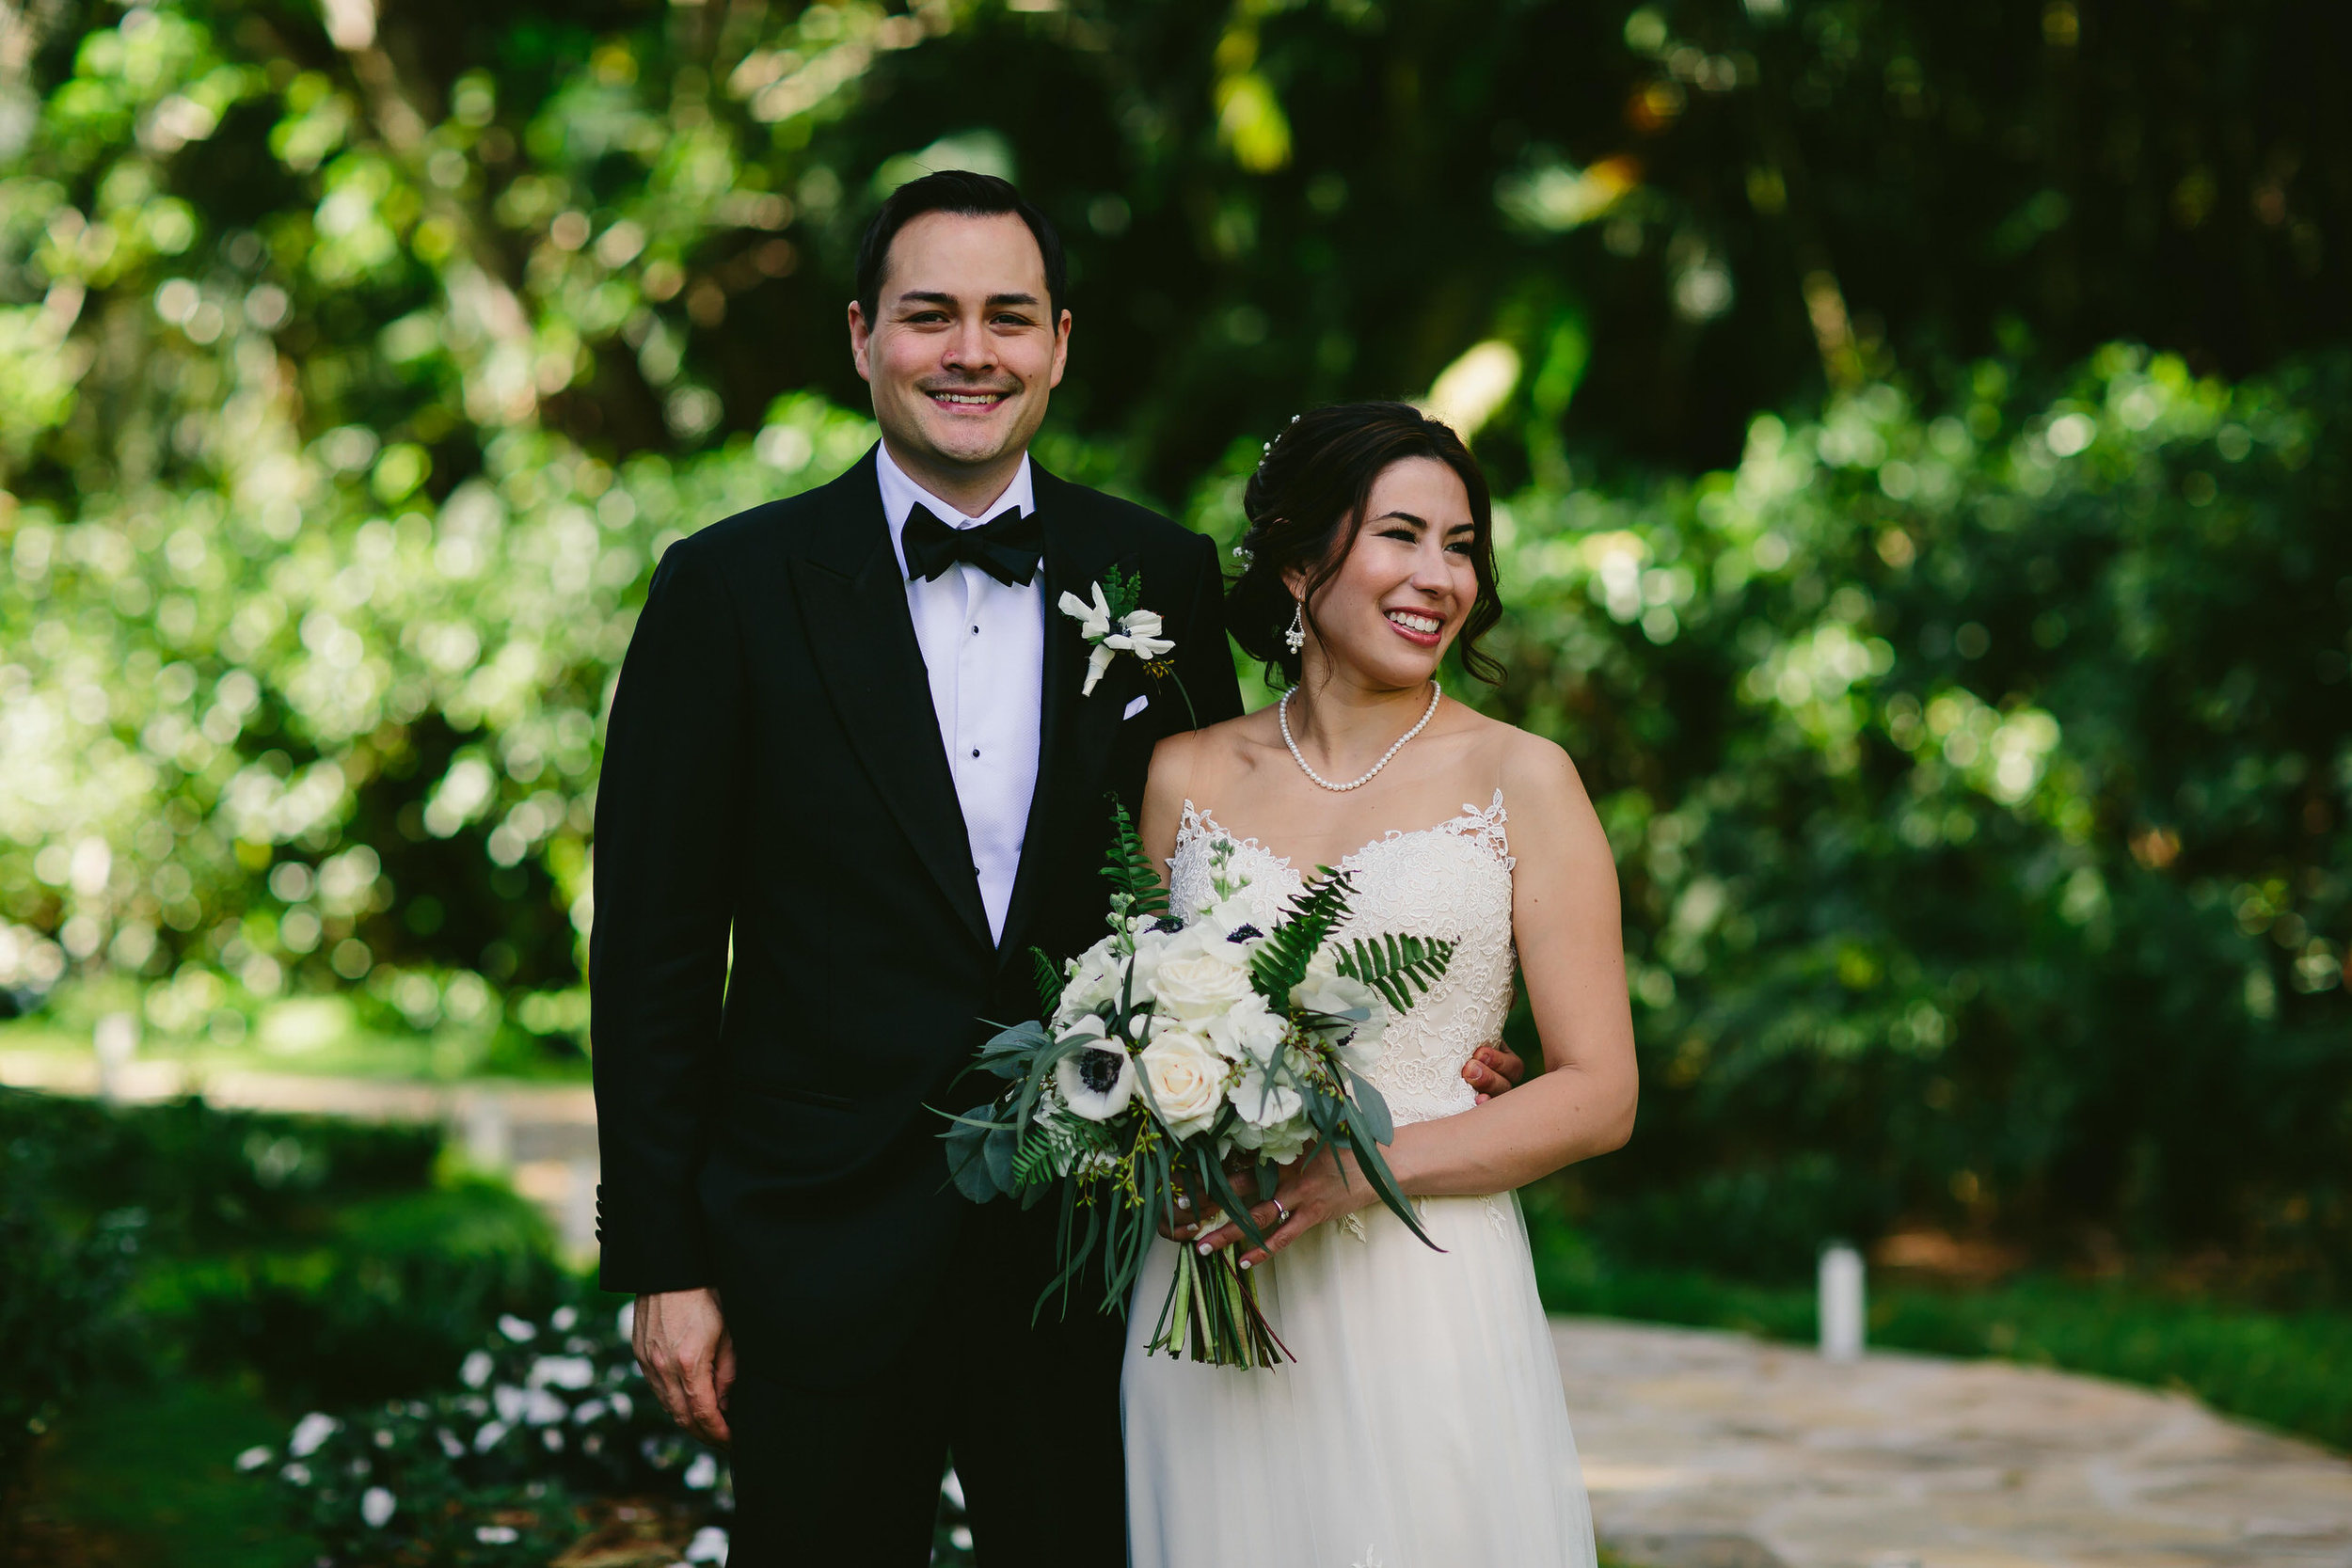 bride_groom_backyard_luxury_wedding_celebrity_south_florida.jpg